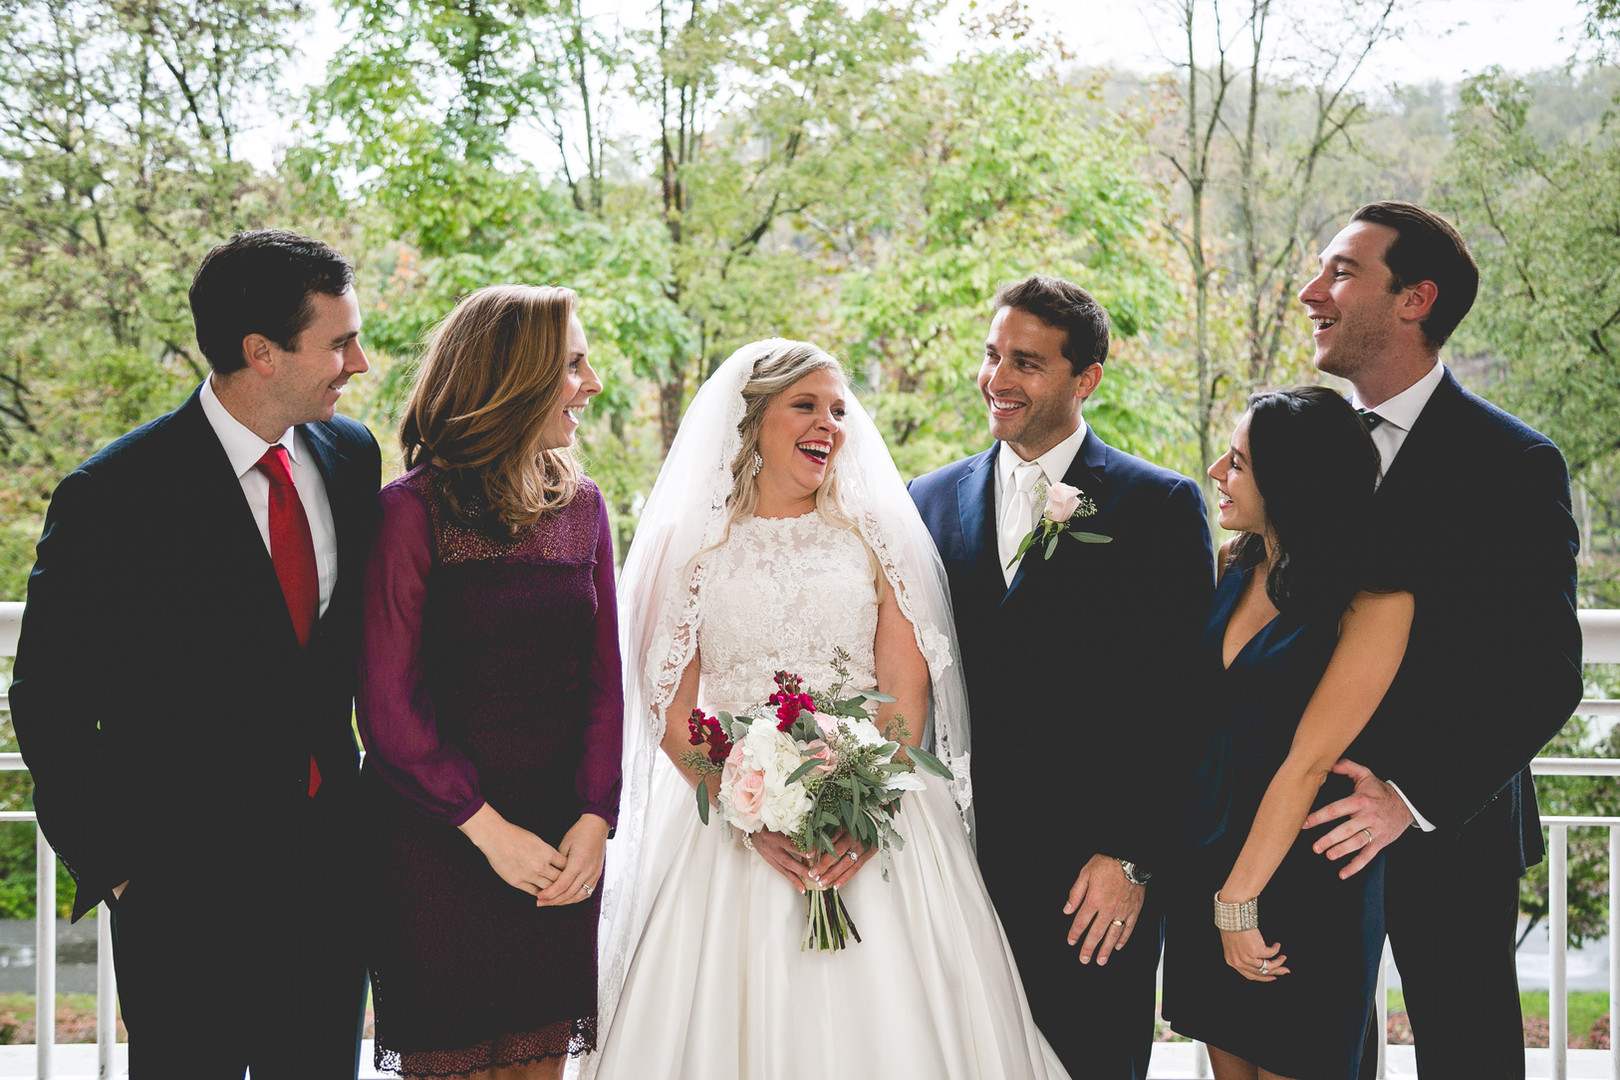 wedding-photo-bride-groom-155.jpg